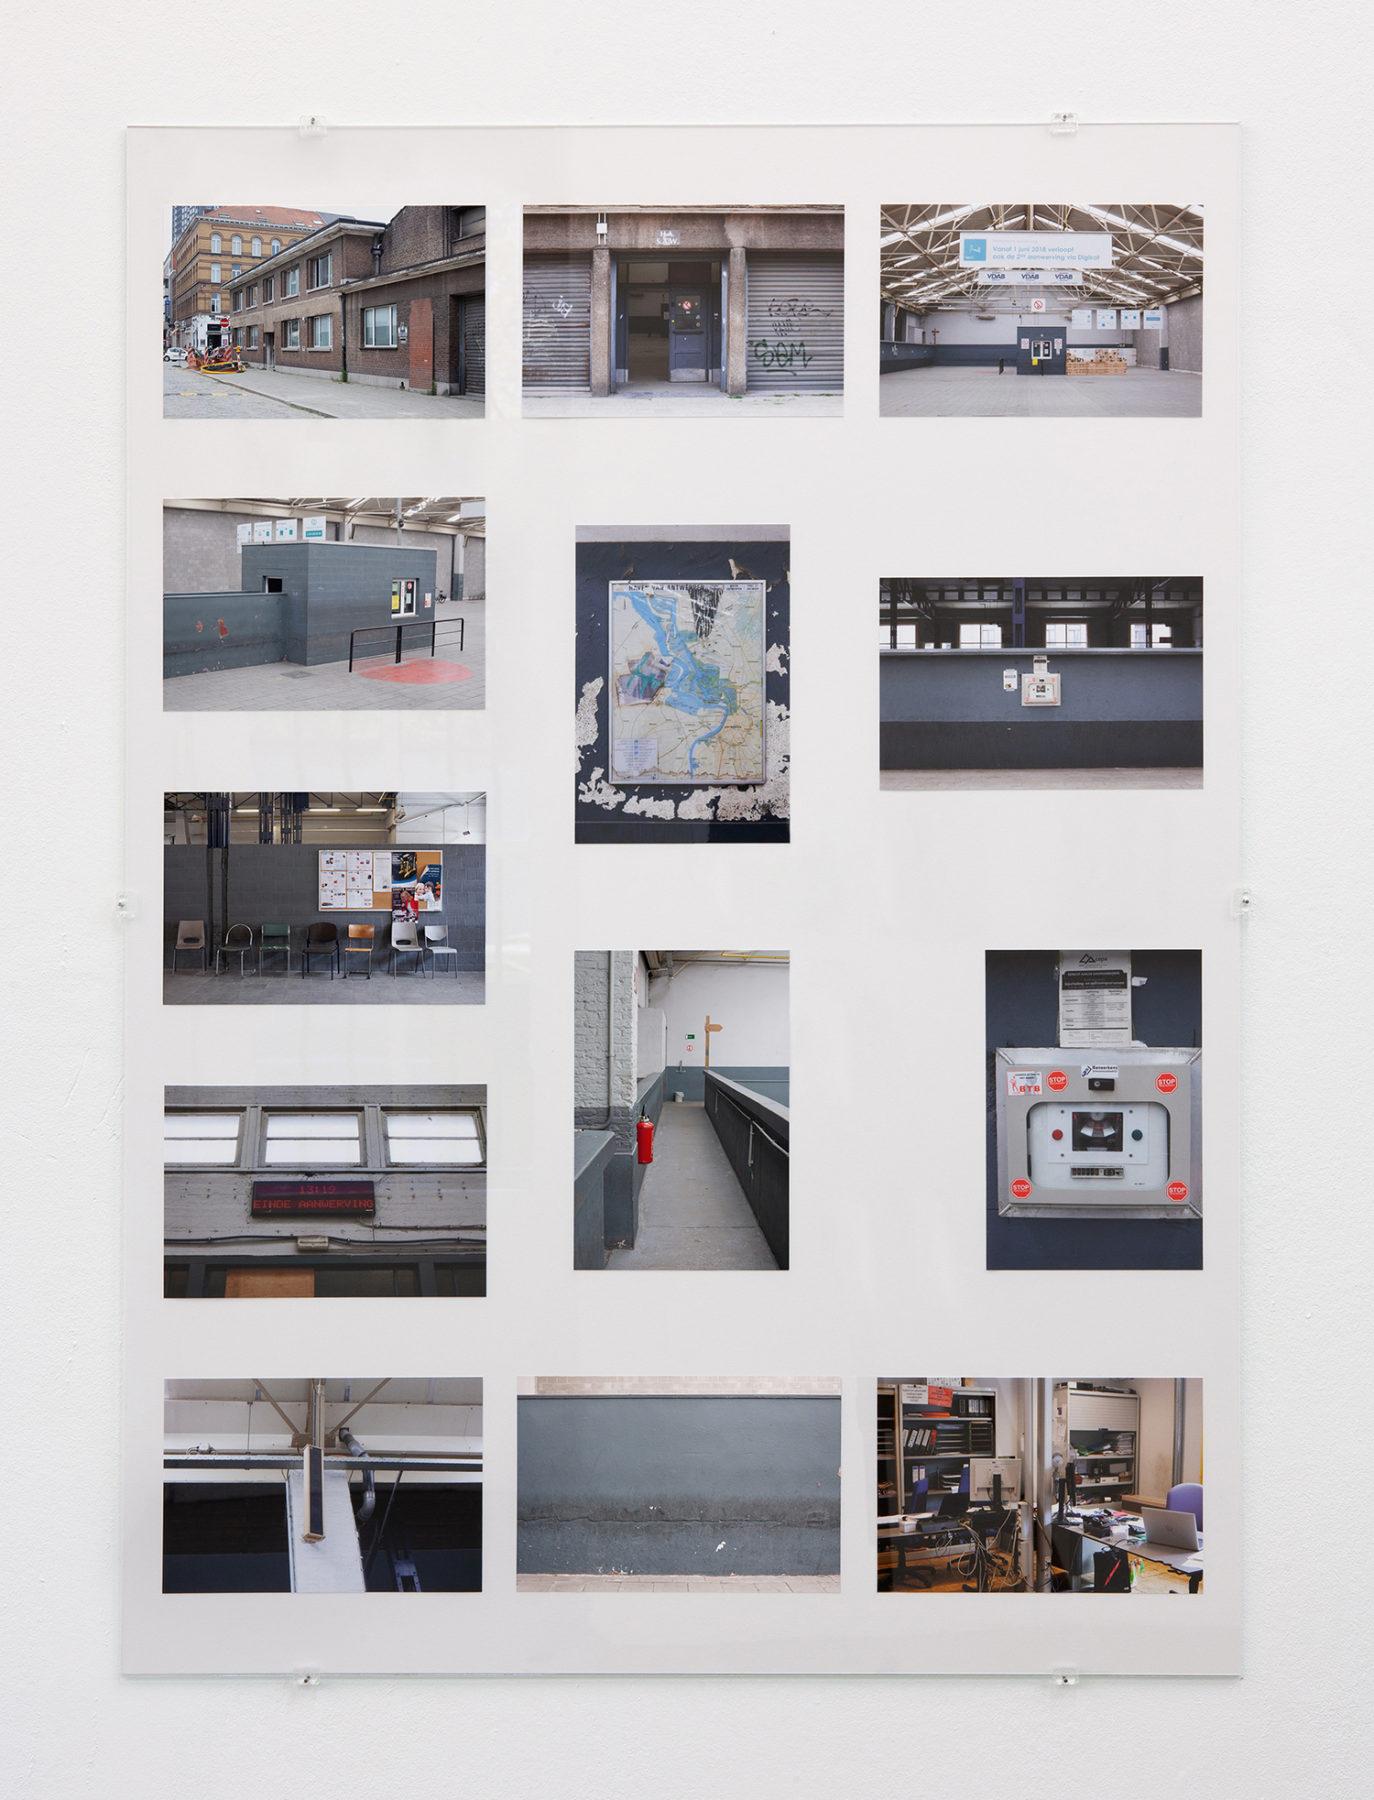 Aanwervingslokaal - Gebouww, pigment prints, glass, 2018